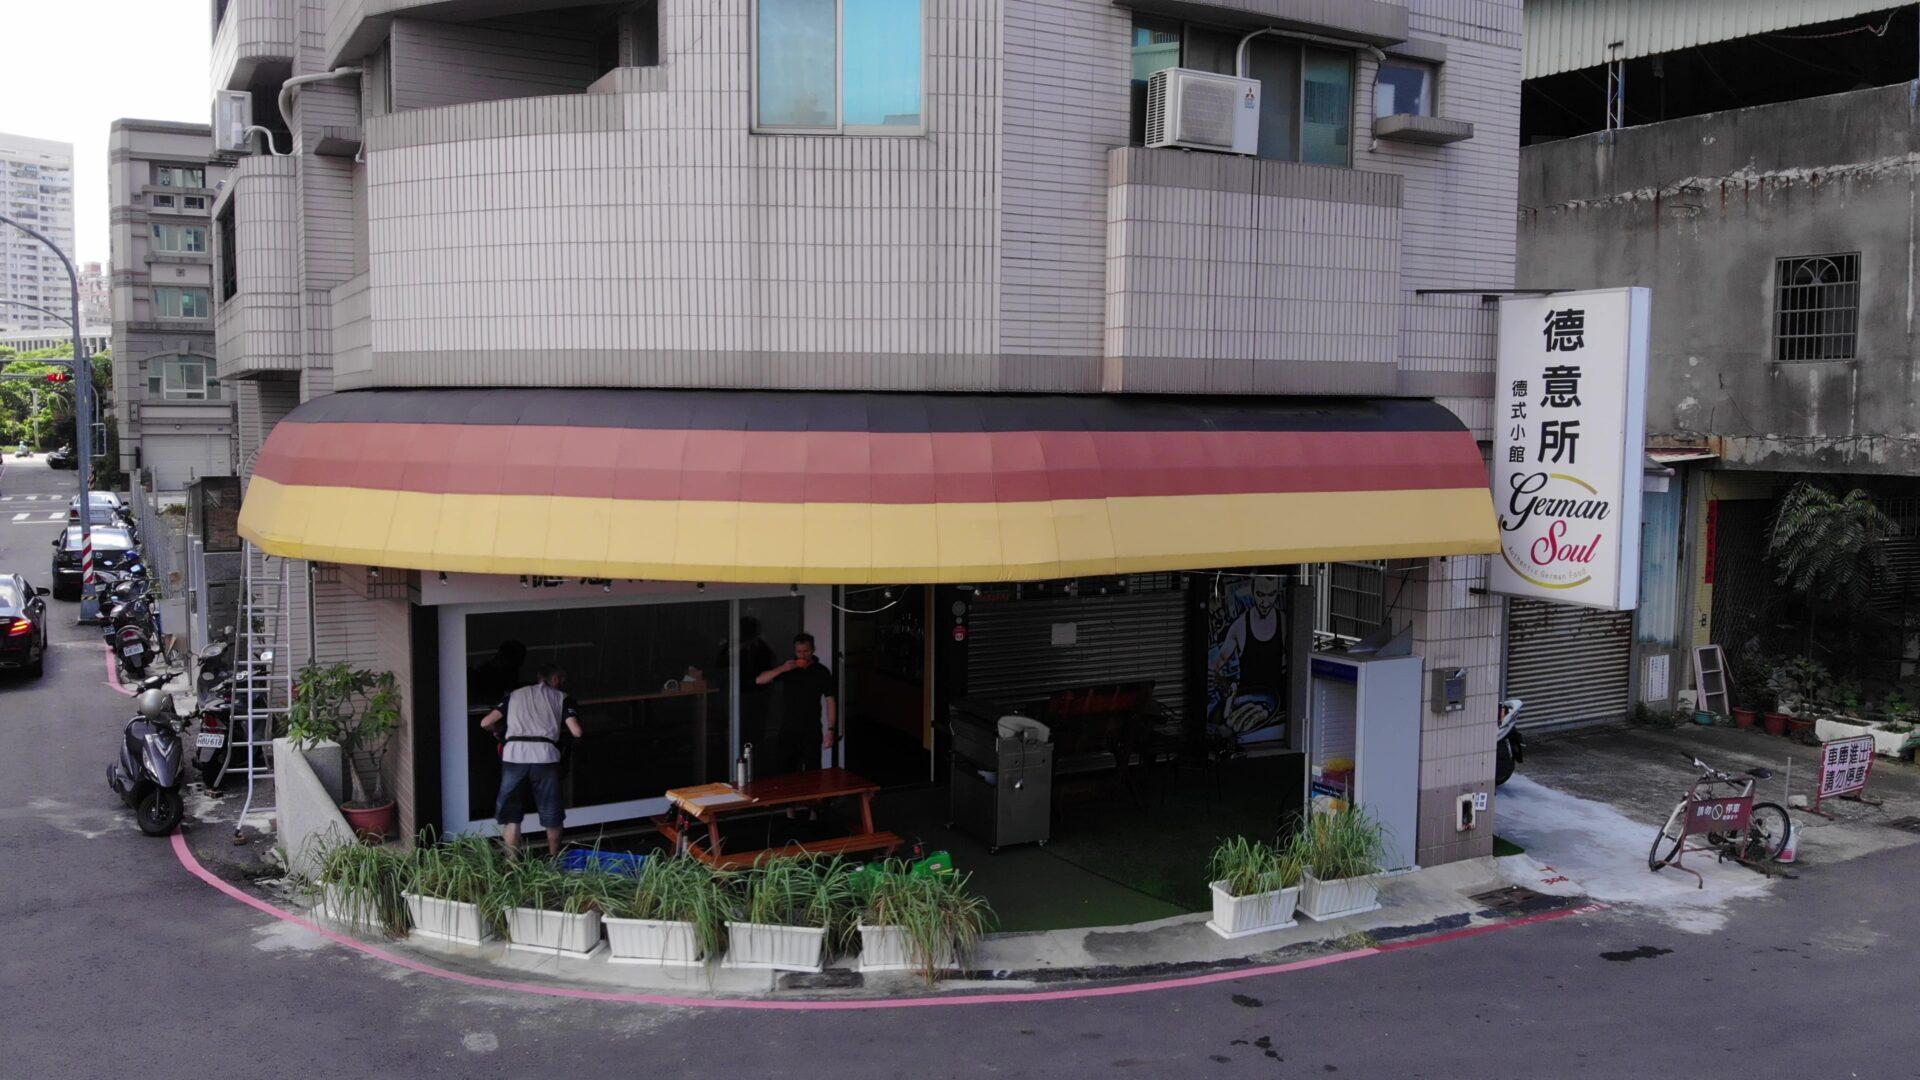 German Soul restaurant